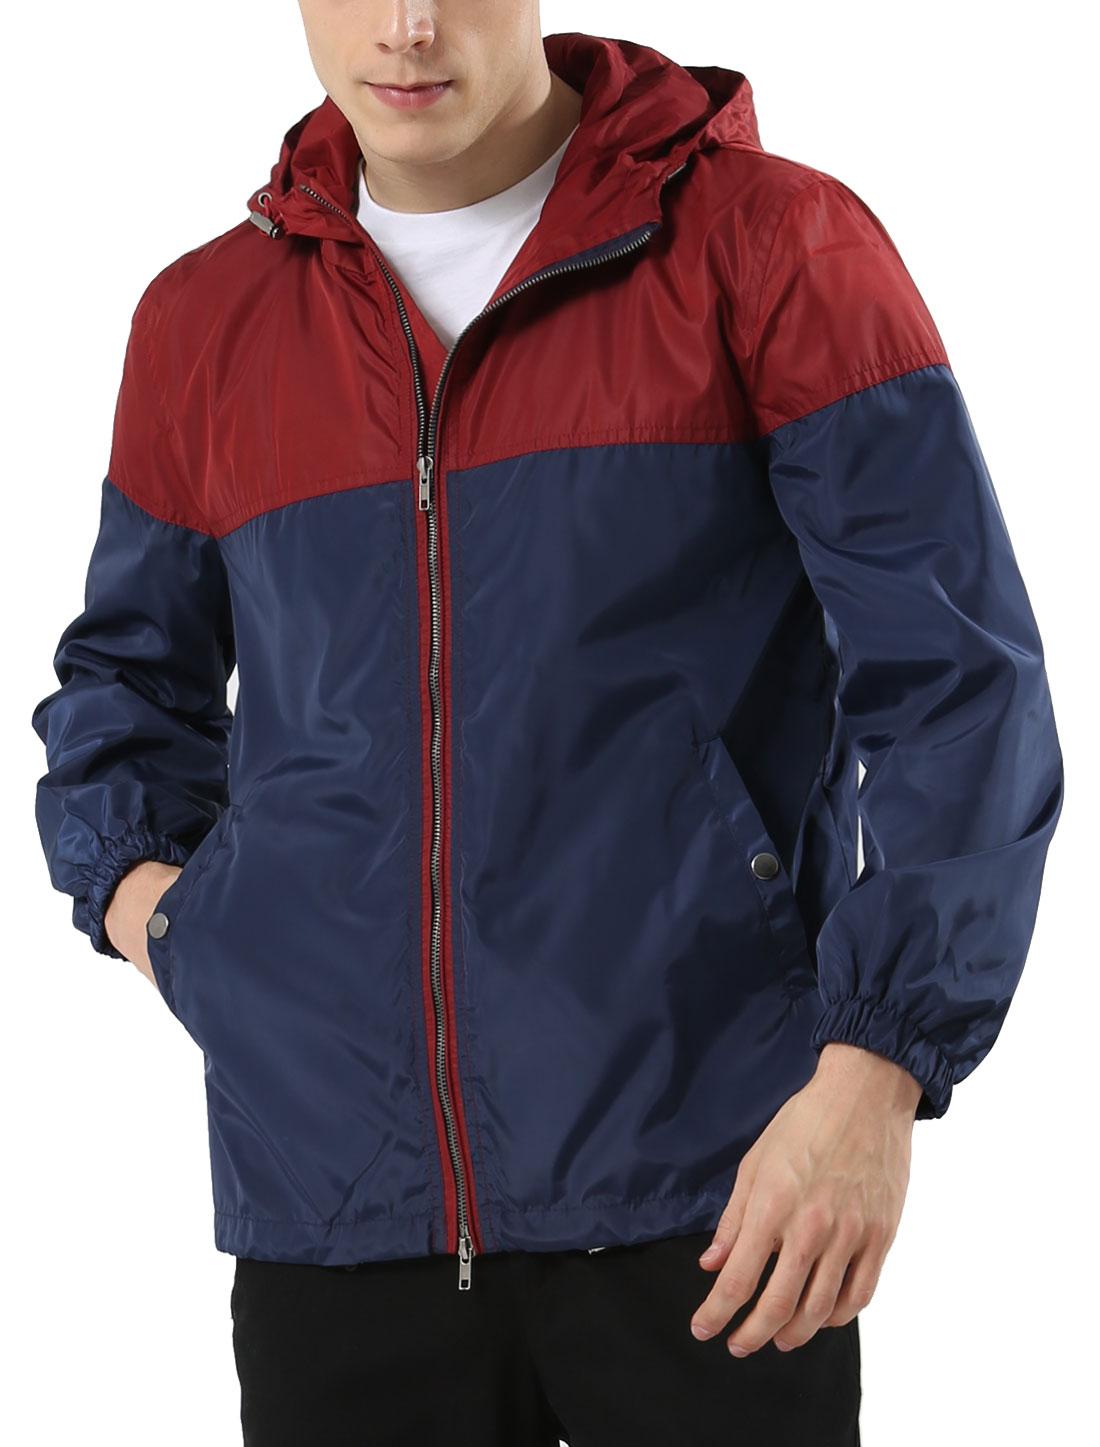 Men Color Block Zipper Front Checks Lining Windbreaker Hoodie Jacket Burgundy Blue S